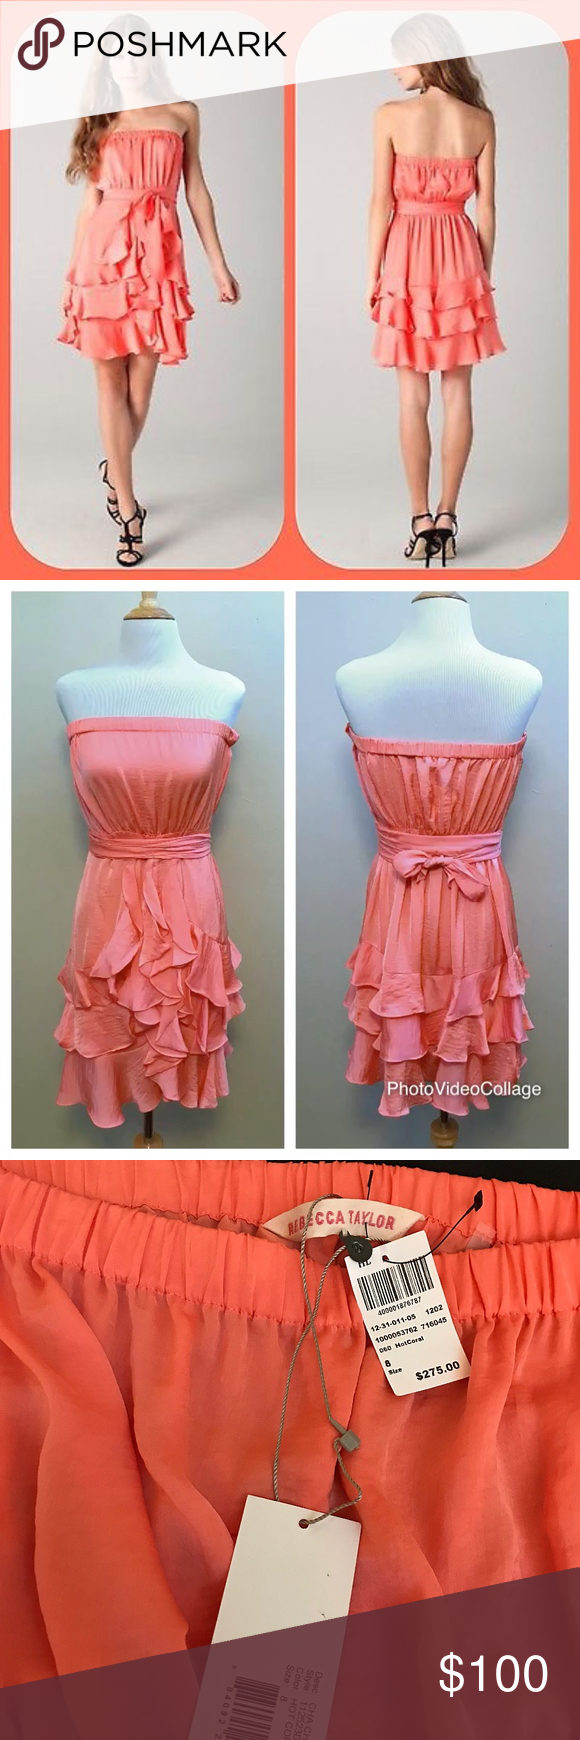 Hot pink and orange dress  NWT Rebecca Taylor Silk Ruffle Dress Hot Coral NWT  Cha cha